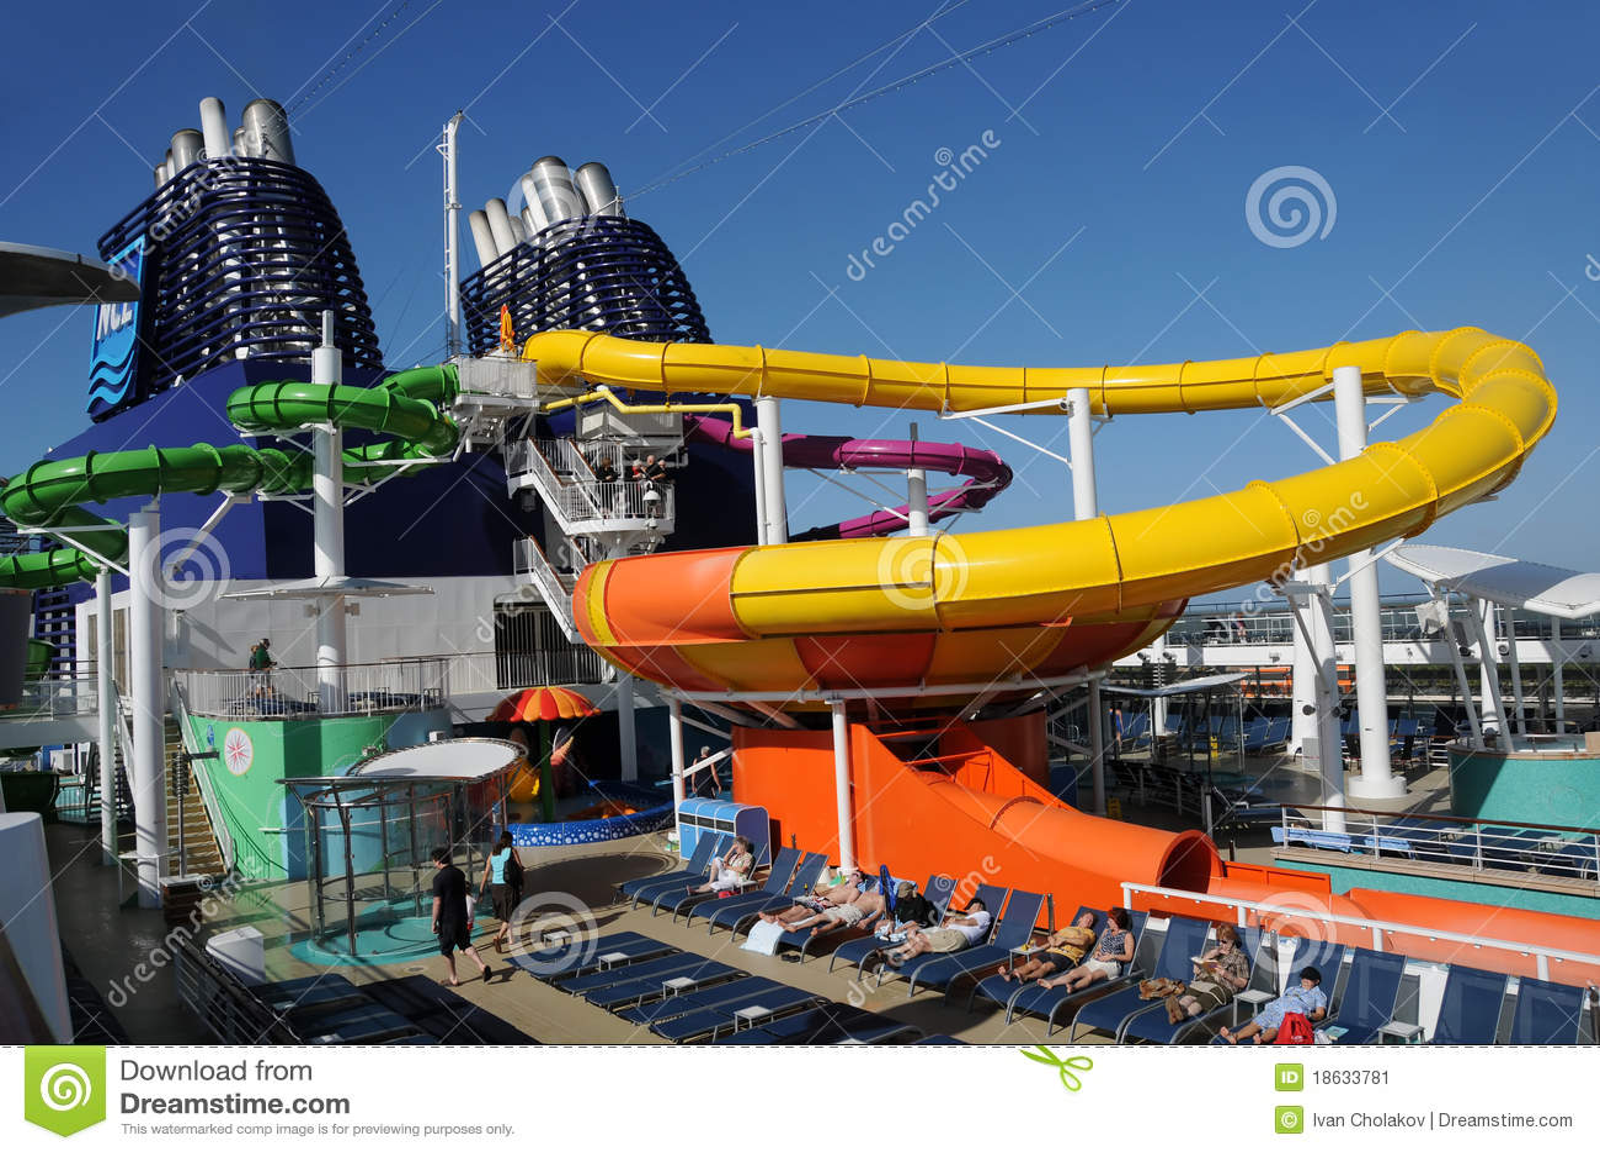 Cruise Ship Water Slide Editorial Photo Image Of Water - Cruise ship slide